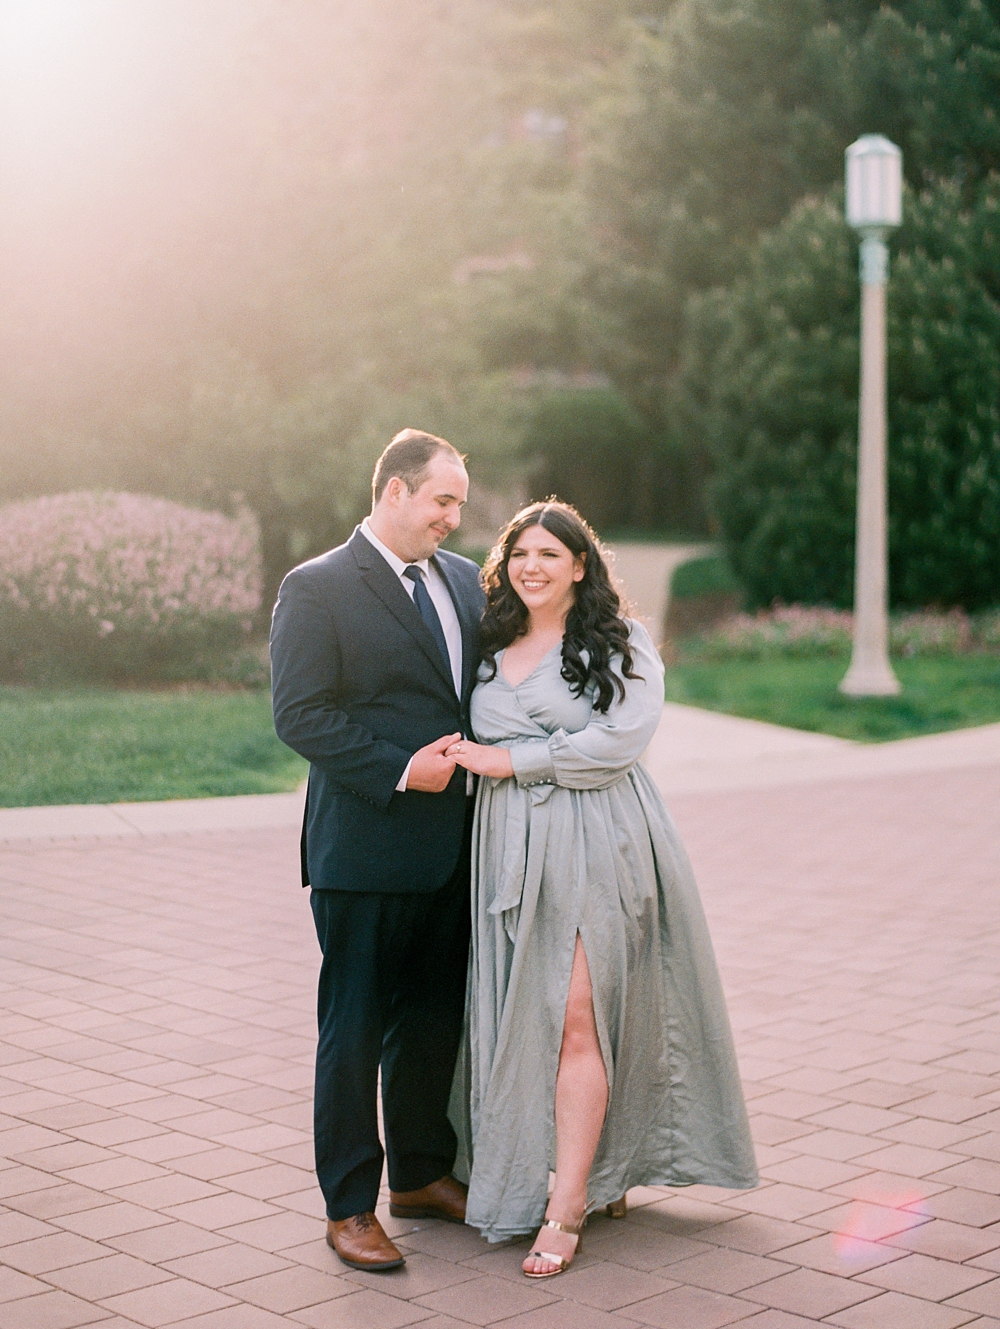 kristin-la-voie-photography-chicago-wedding-photographer-loyola-engagement-1